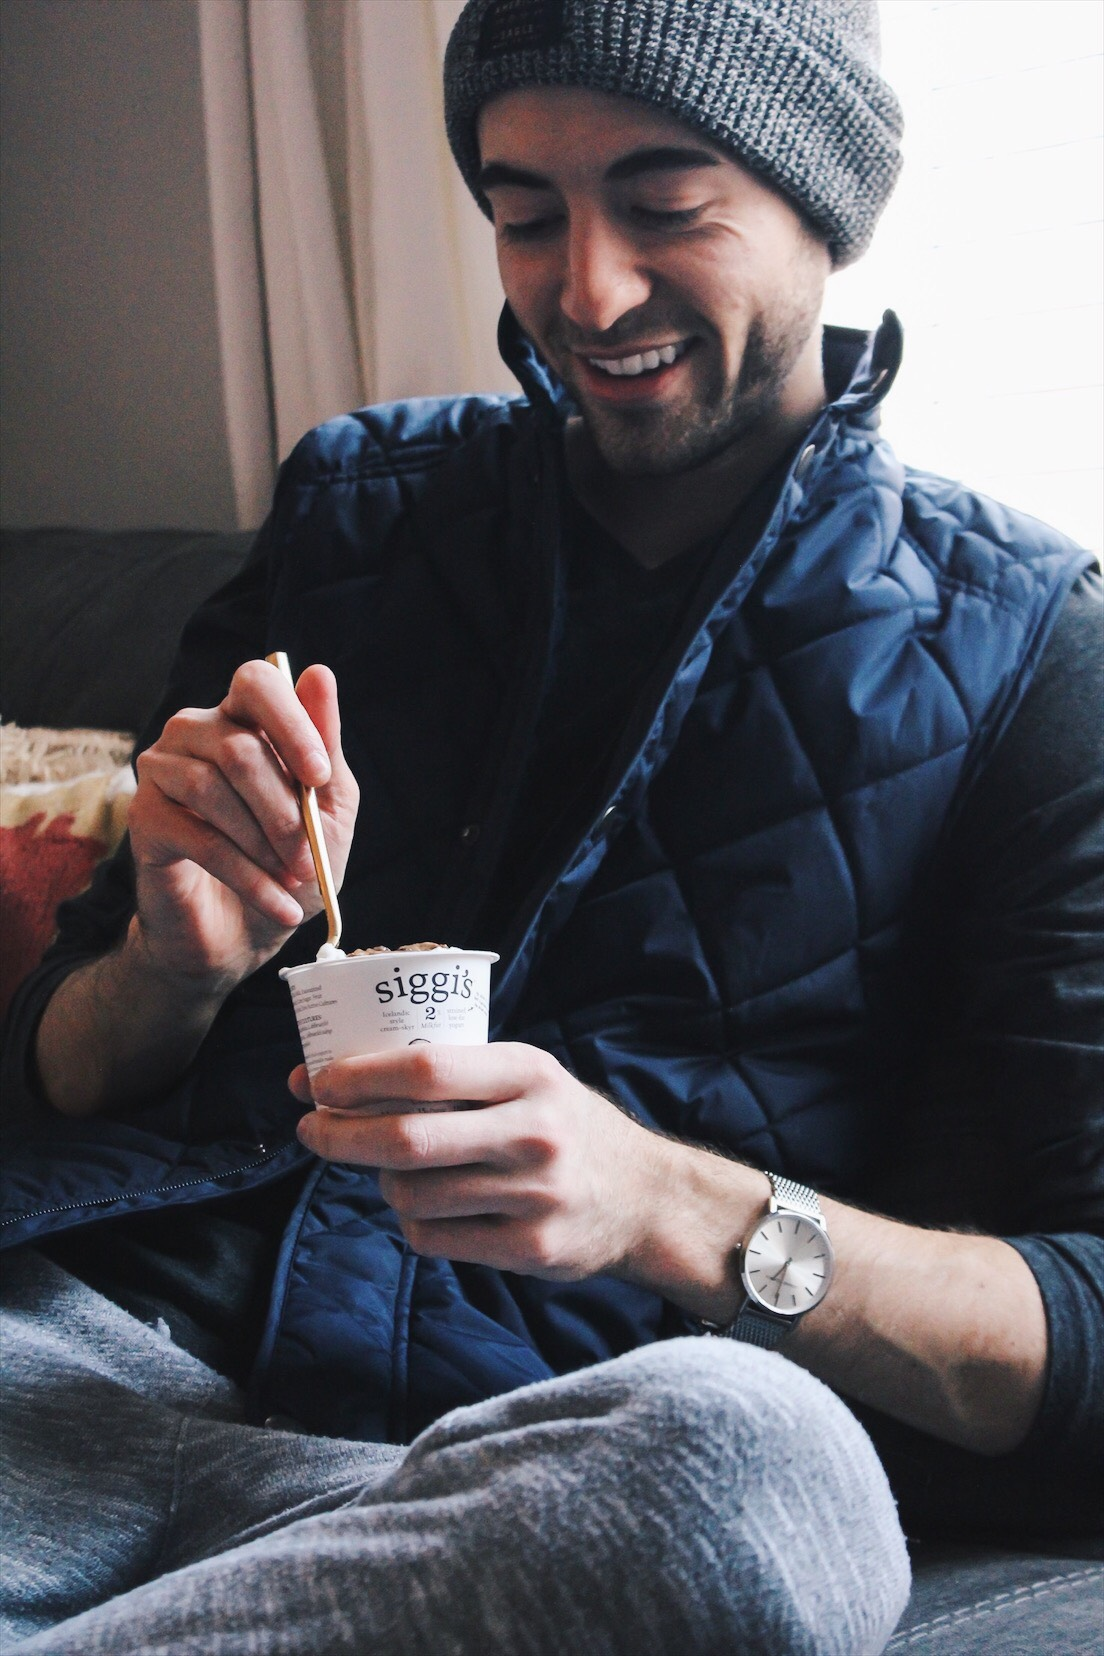 alex holding siggis yogurt